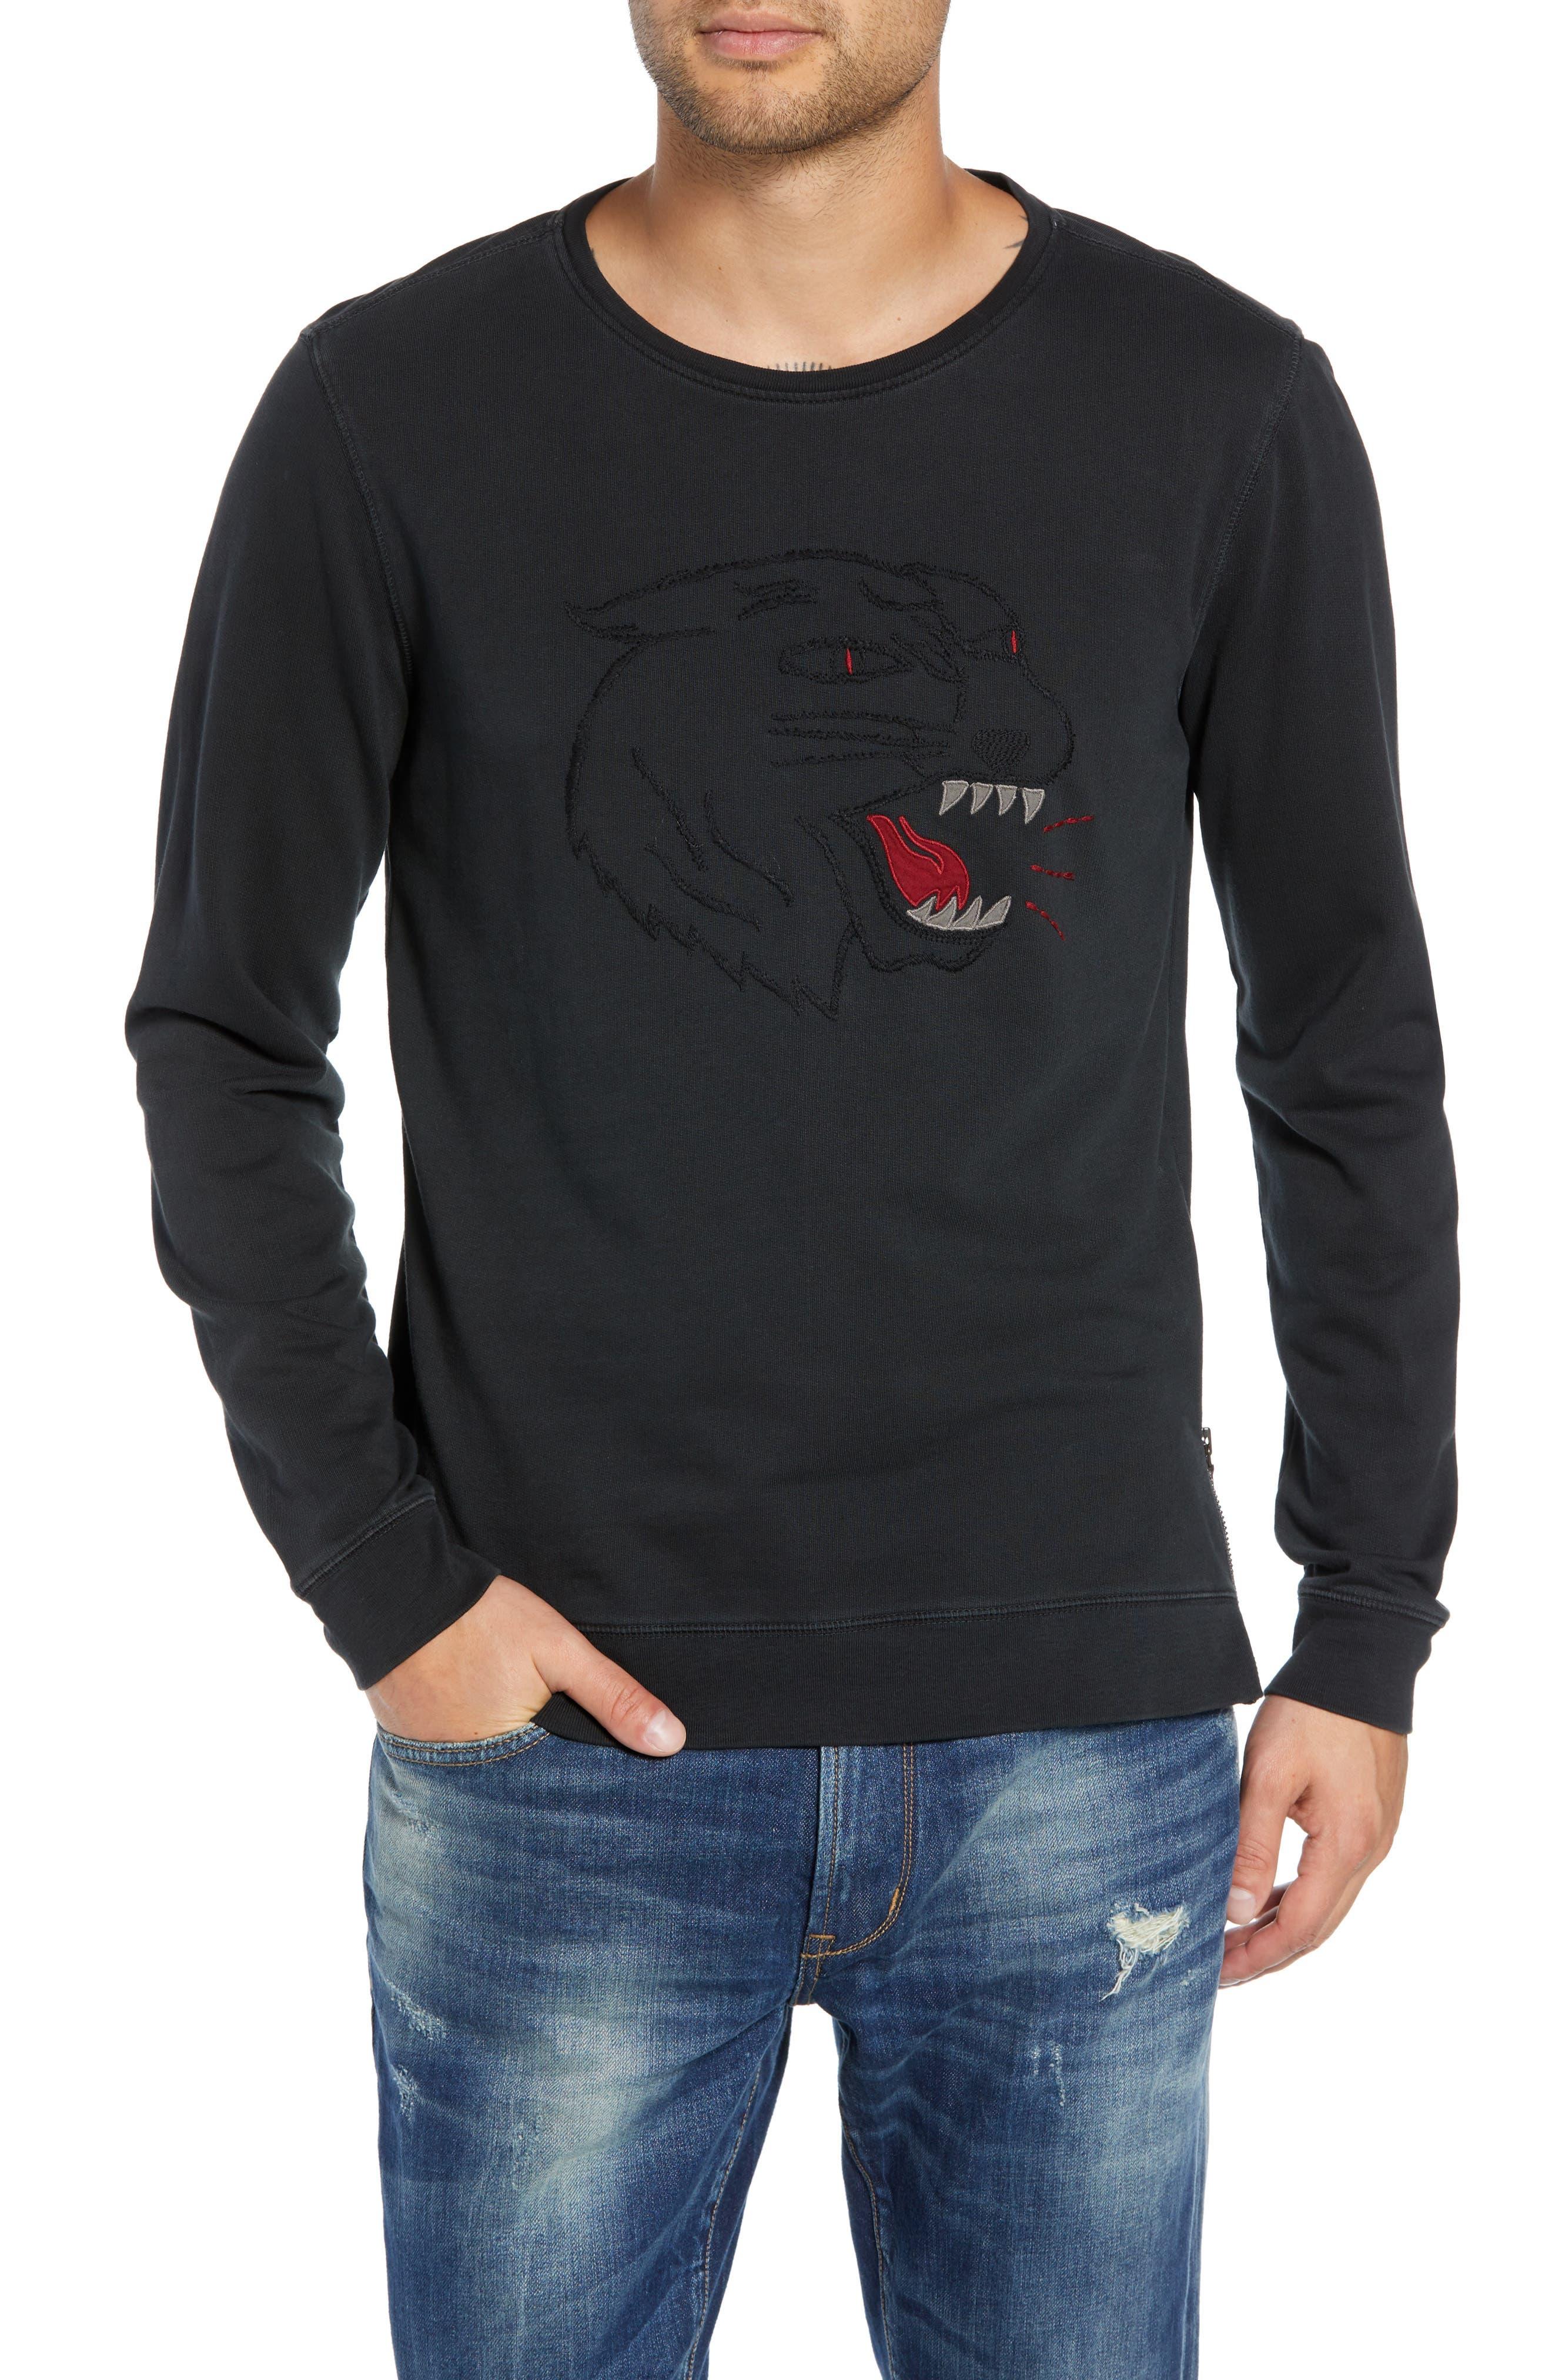 Cat Eyes Embroidered Sweatshirt,                             Main thumbnail 1, color,                             001